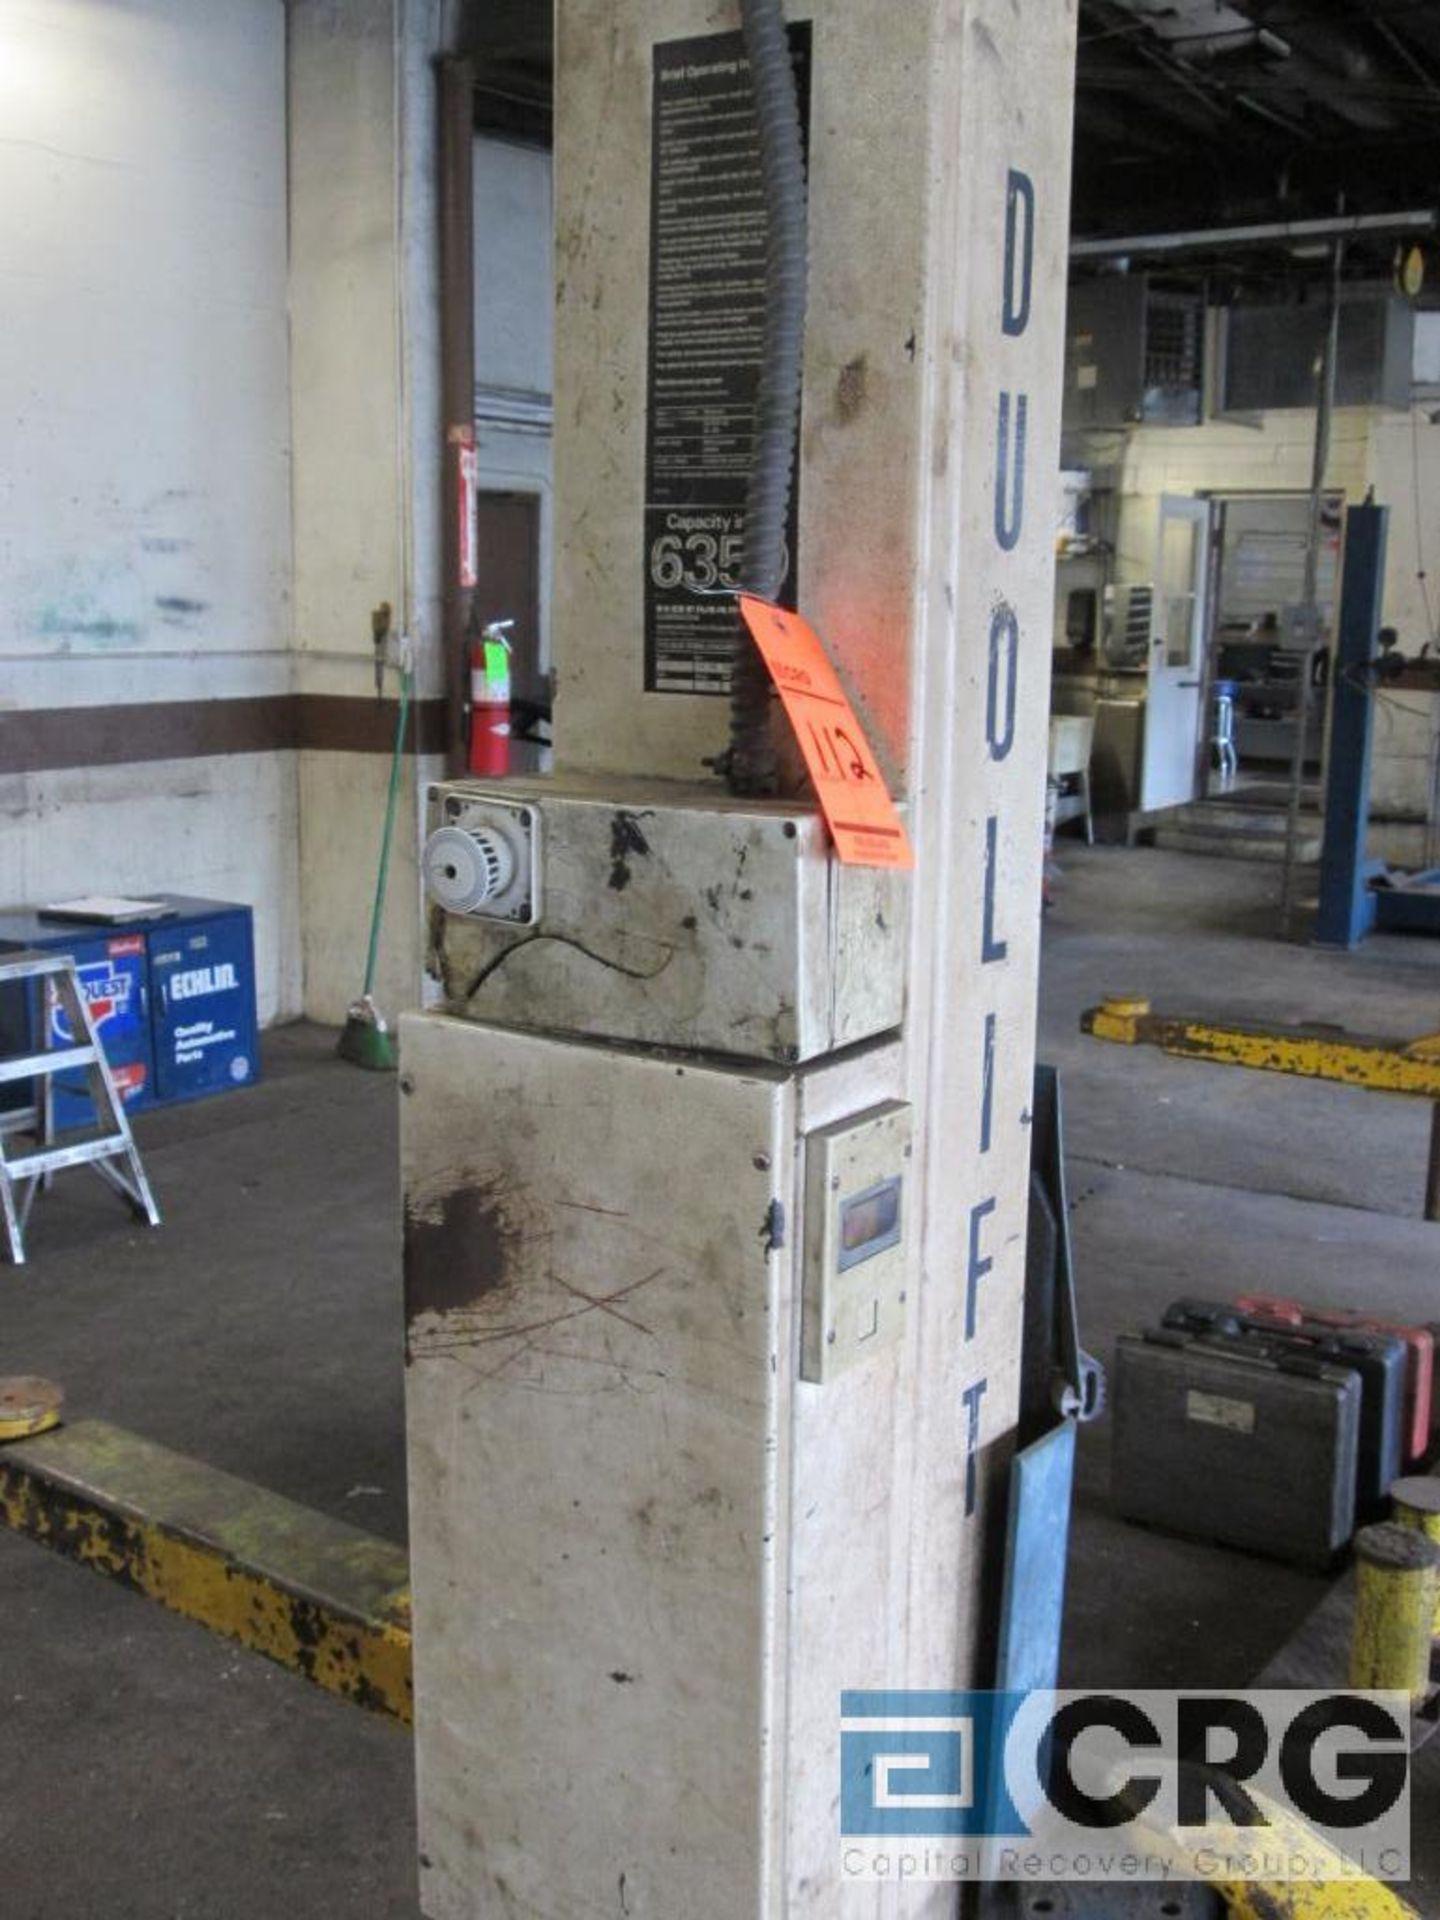 Duolift 2 post hydraulic auto lift, type GE 2.5, No. 10 84 15696, 6.350 lb. cap., 220V, 20 amp, 3. - Image 2 of 3